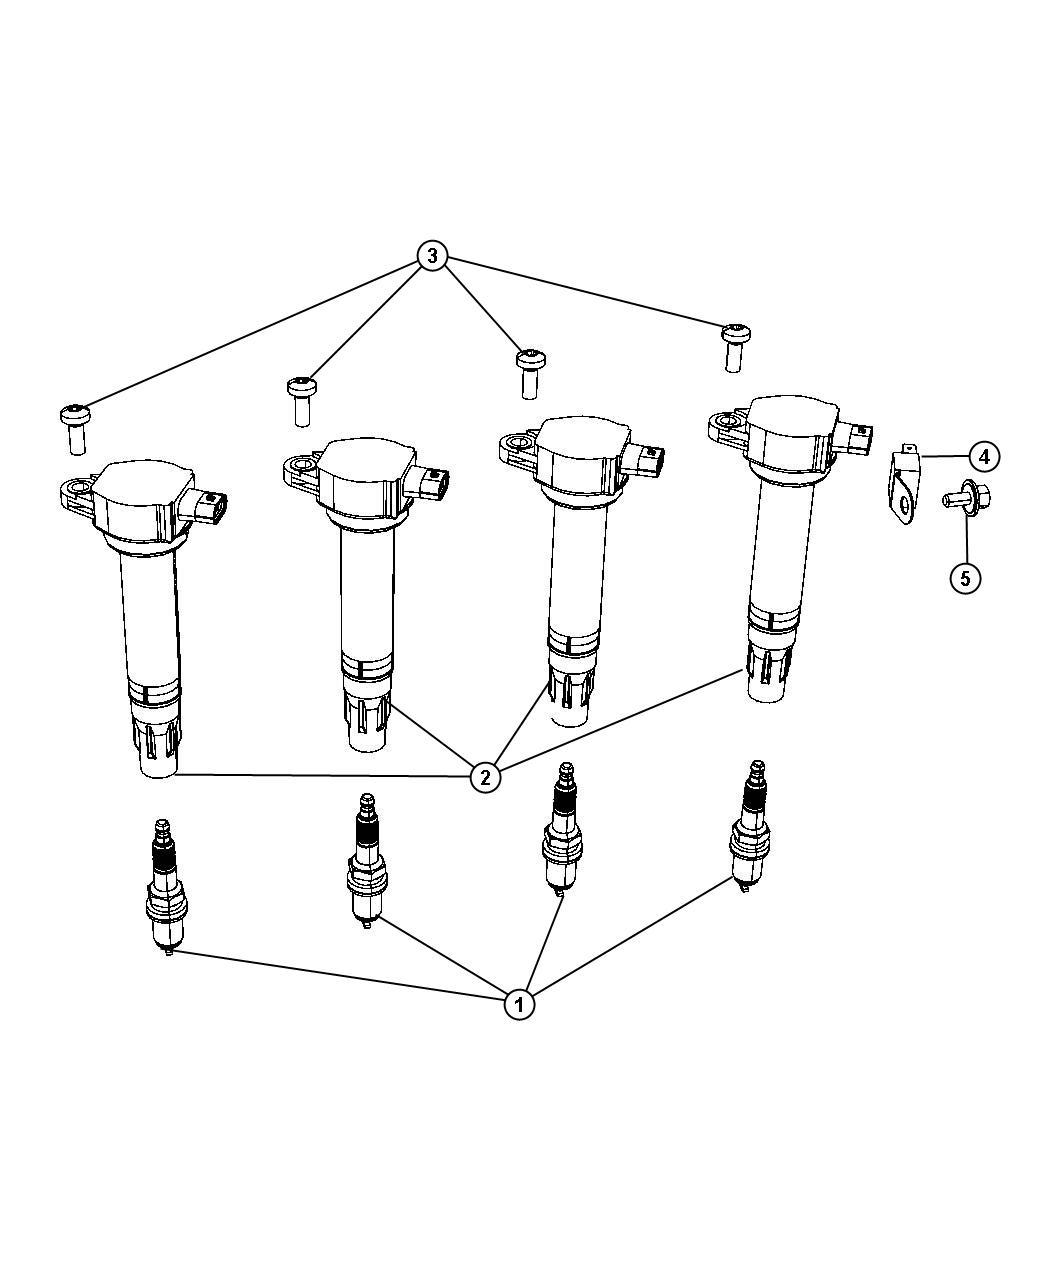 2011 Dodge Journey Spark Plug  Resistor  Plugs  Ignition  Electrical